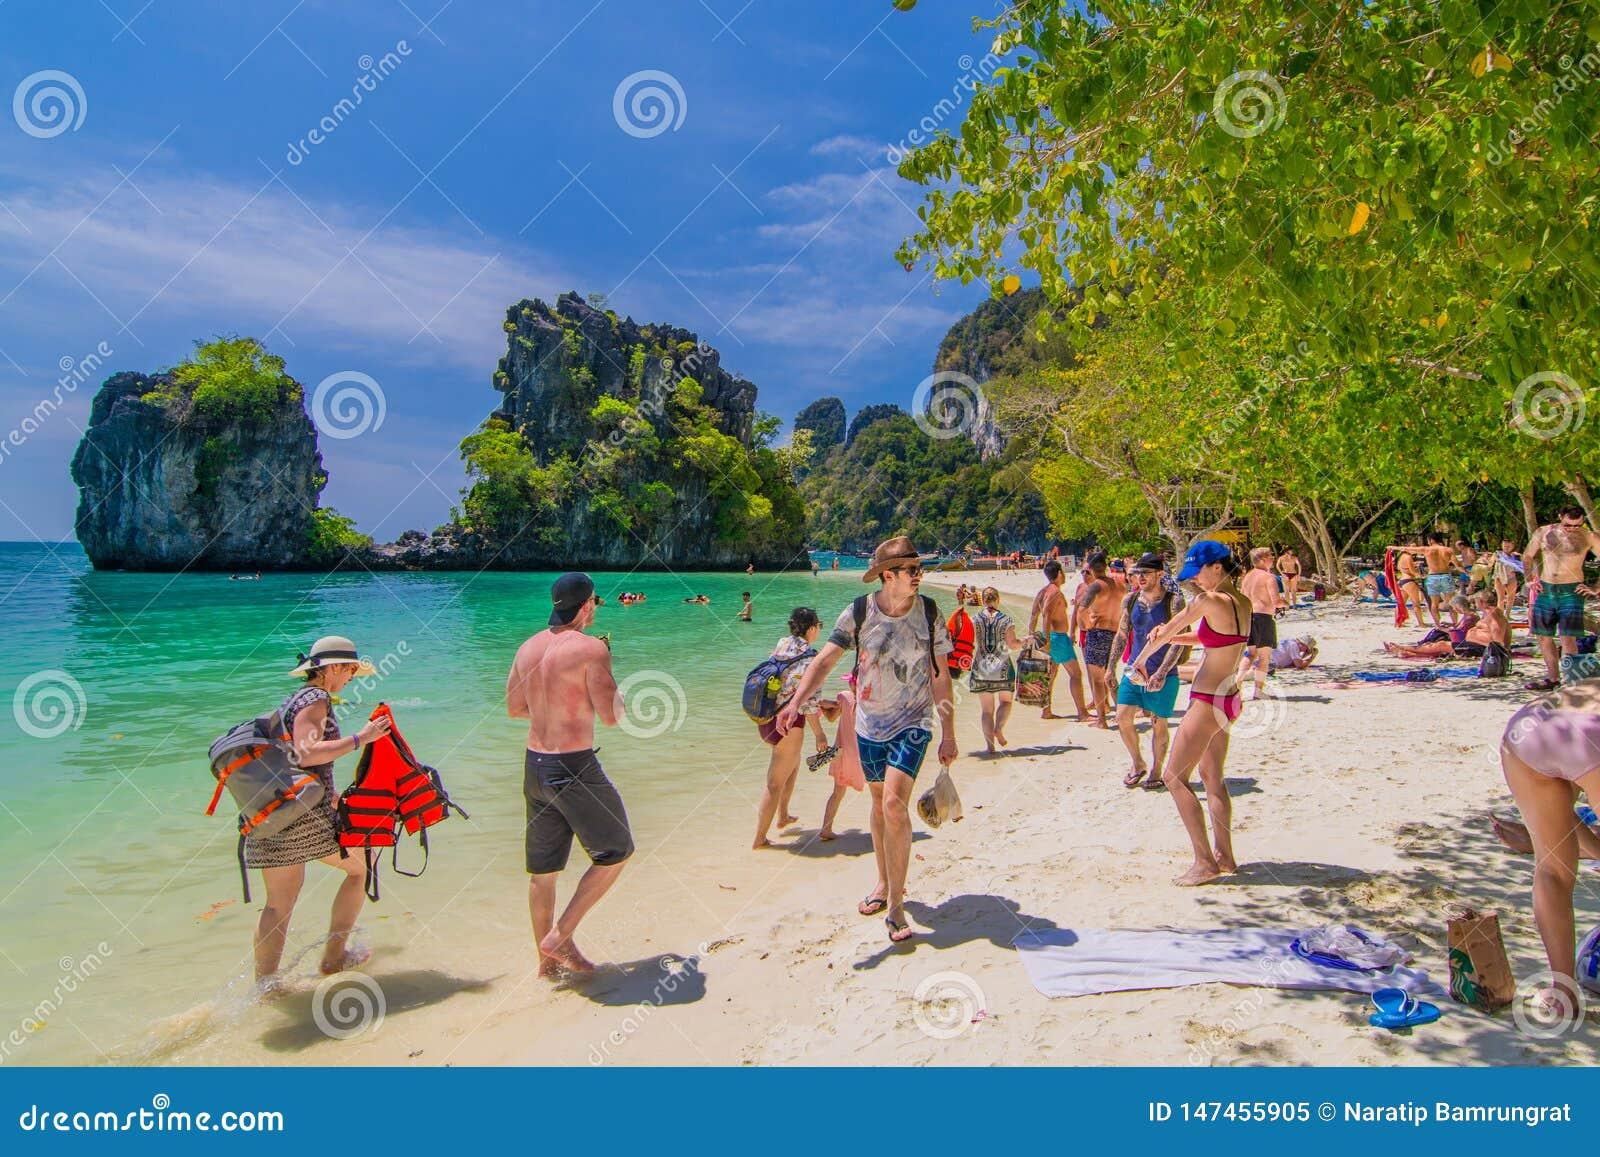 Krabi Thailand February 23 2019 Many Tourists With Summer